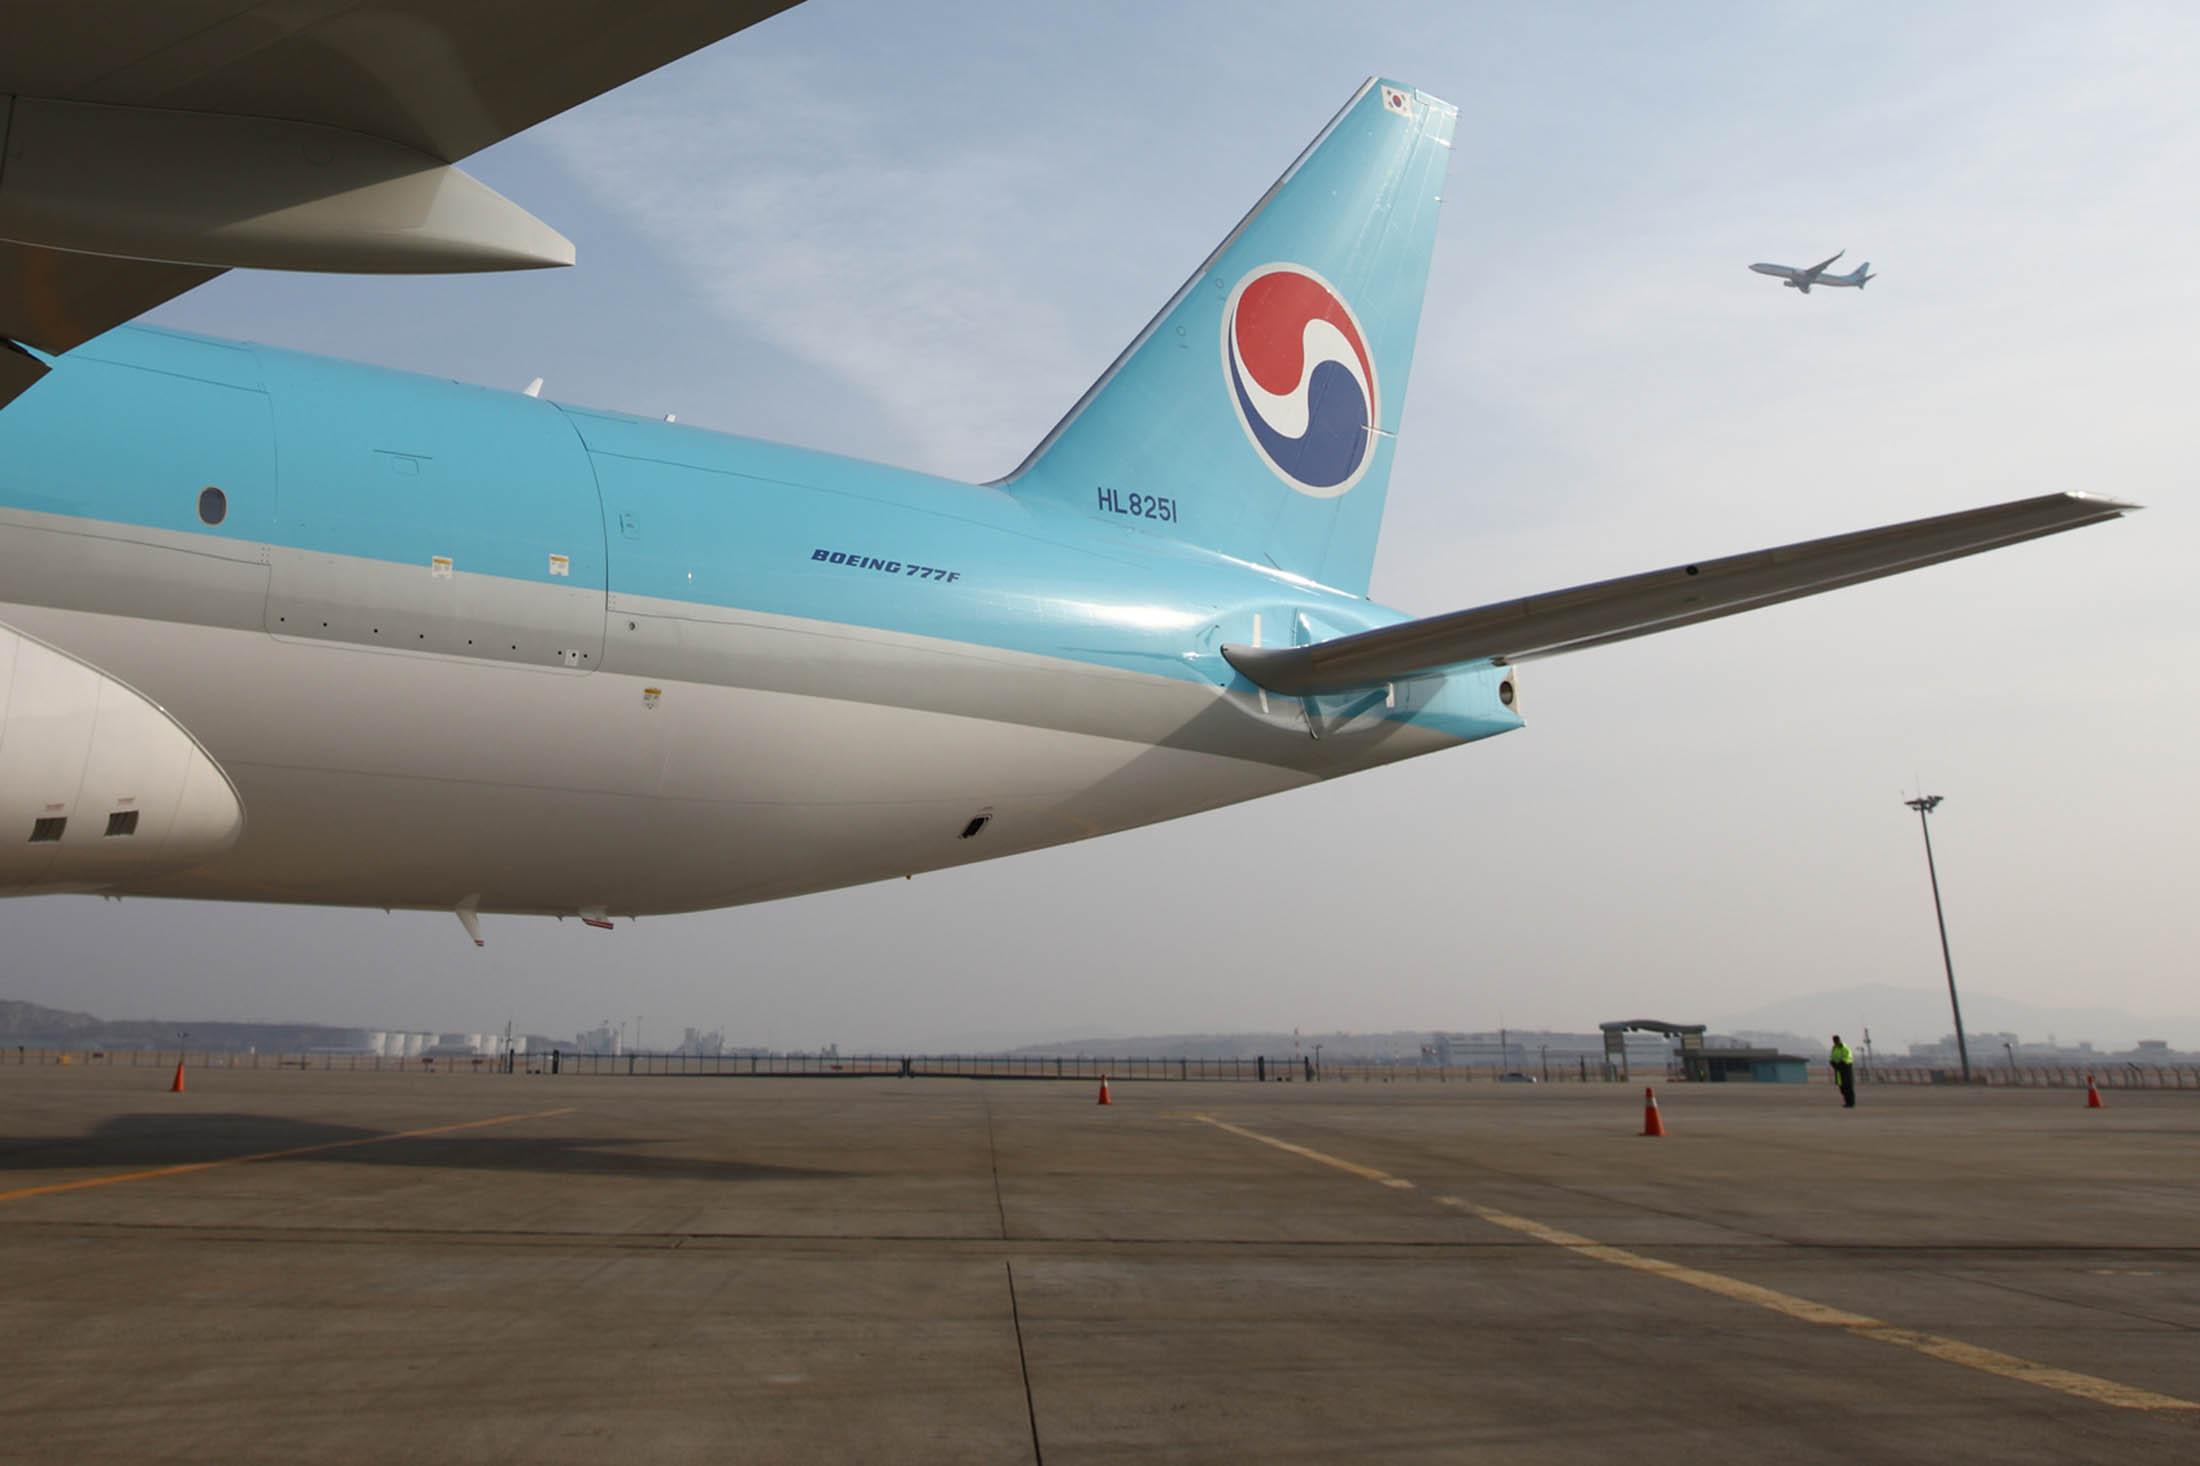 Boeing deepens jetliner job cuts as risk of sales downturn looms bloomberg - Boeing Deepens Jetliner Job Cuts As Risk Of Sales Downturn Looms Bloomberg 24